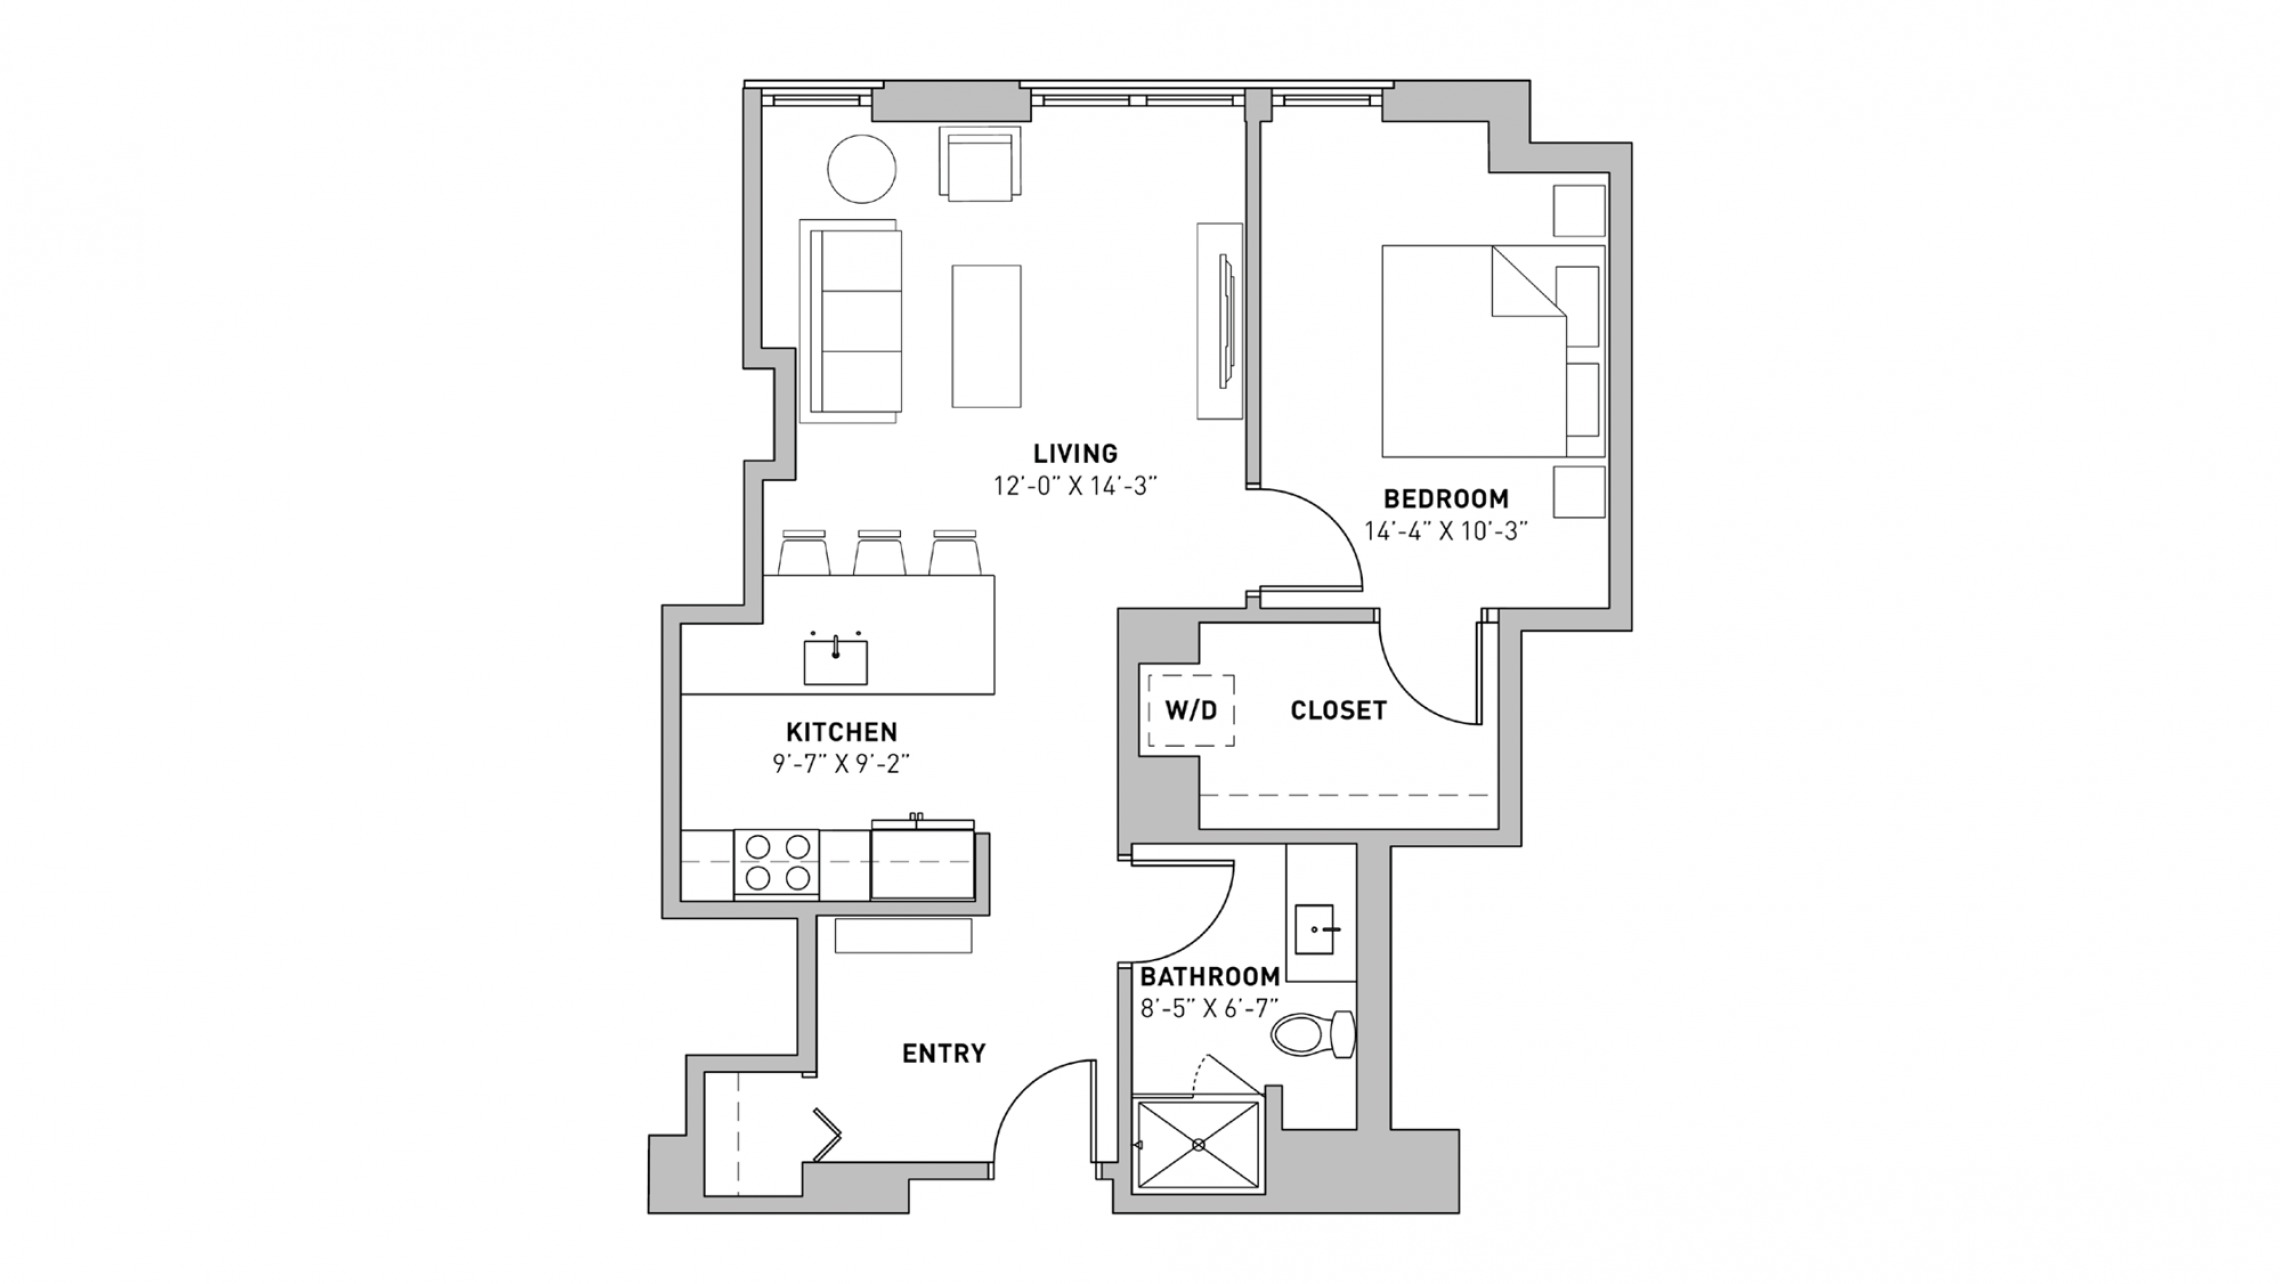 ULI The Pressman 605 - One Bedroom, One Bathroom